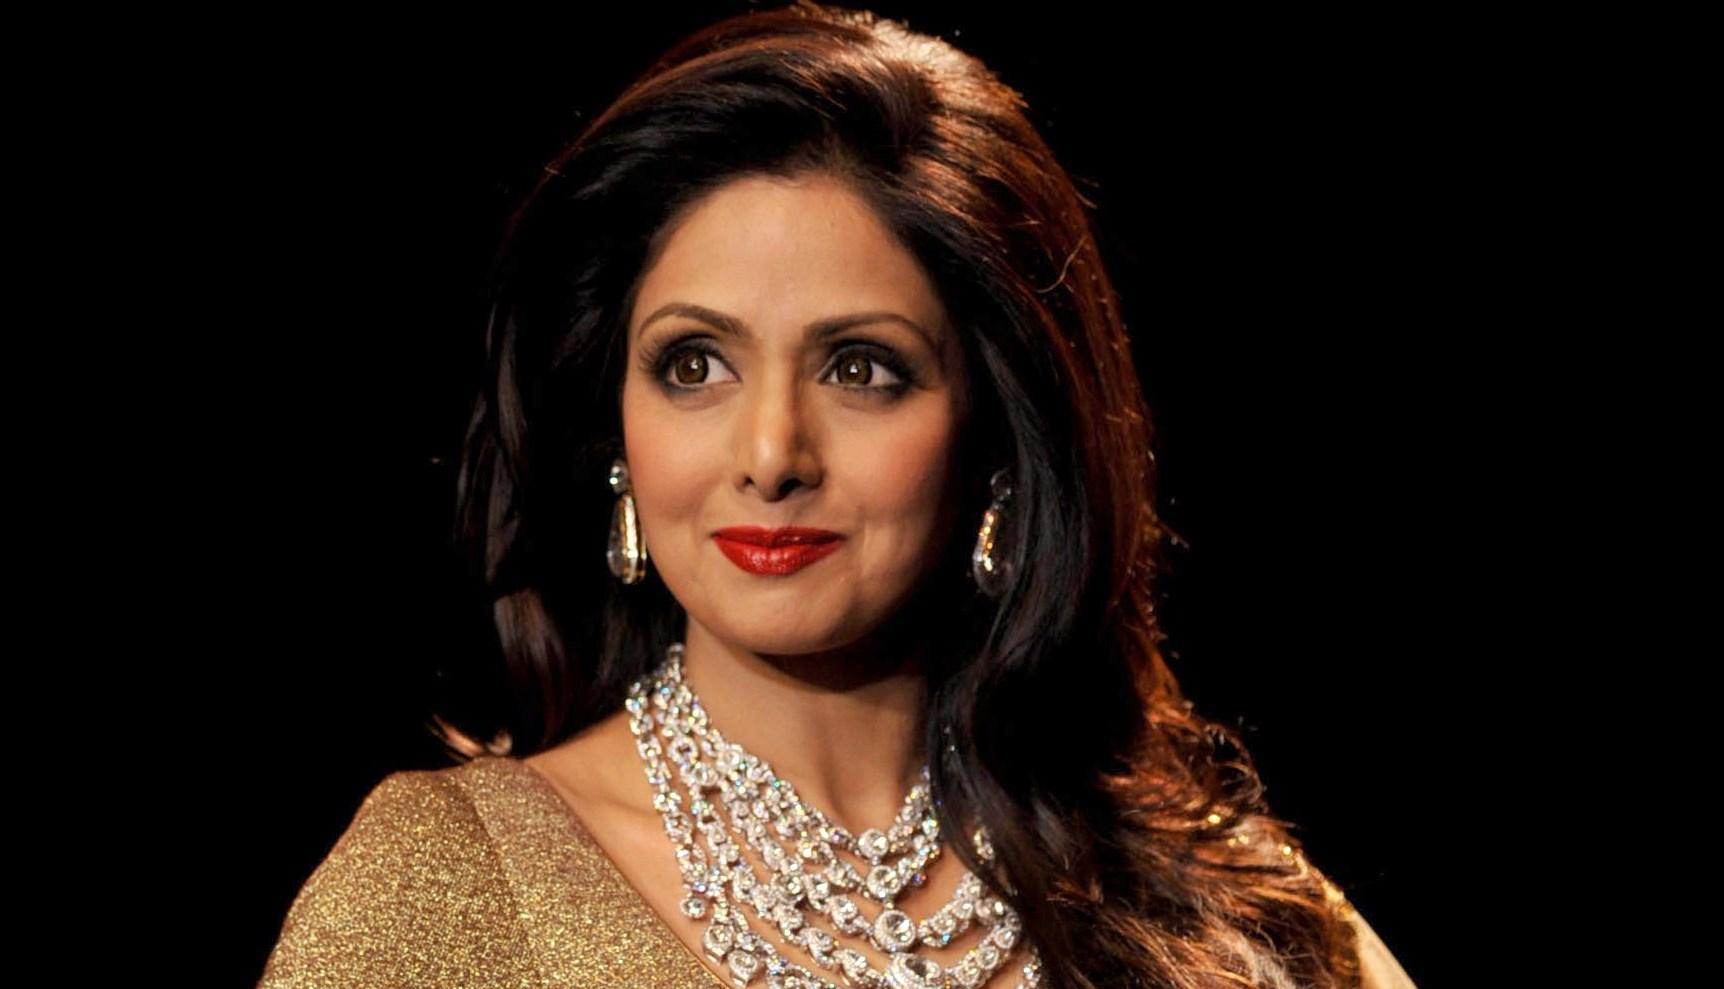 Sridevi, Legendary Bollywood Actress, Dead At 54 - Cbs News-9405